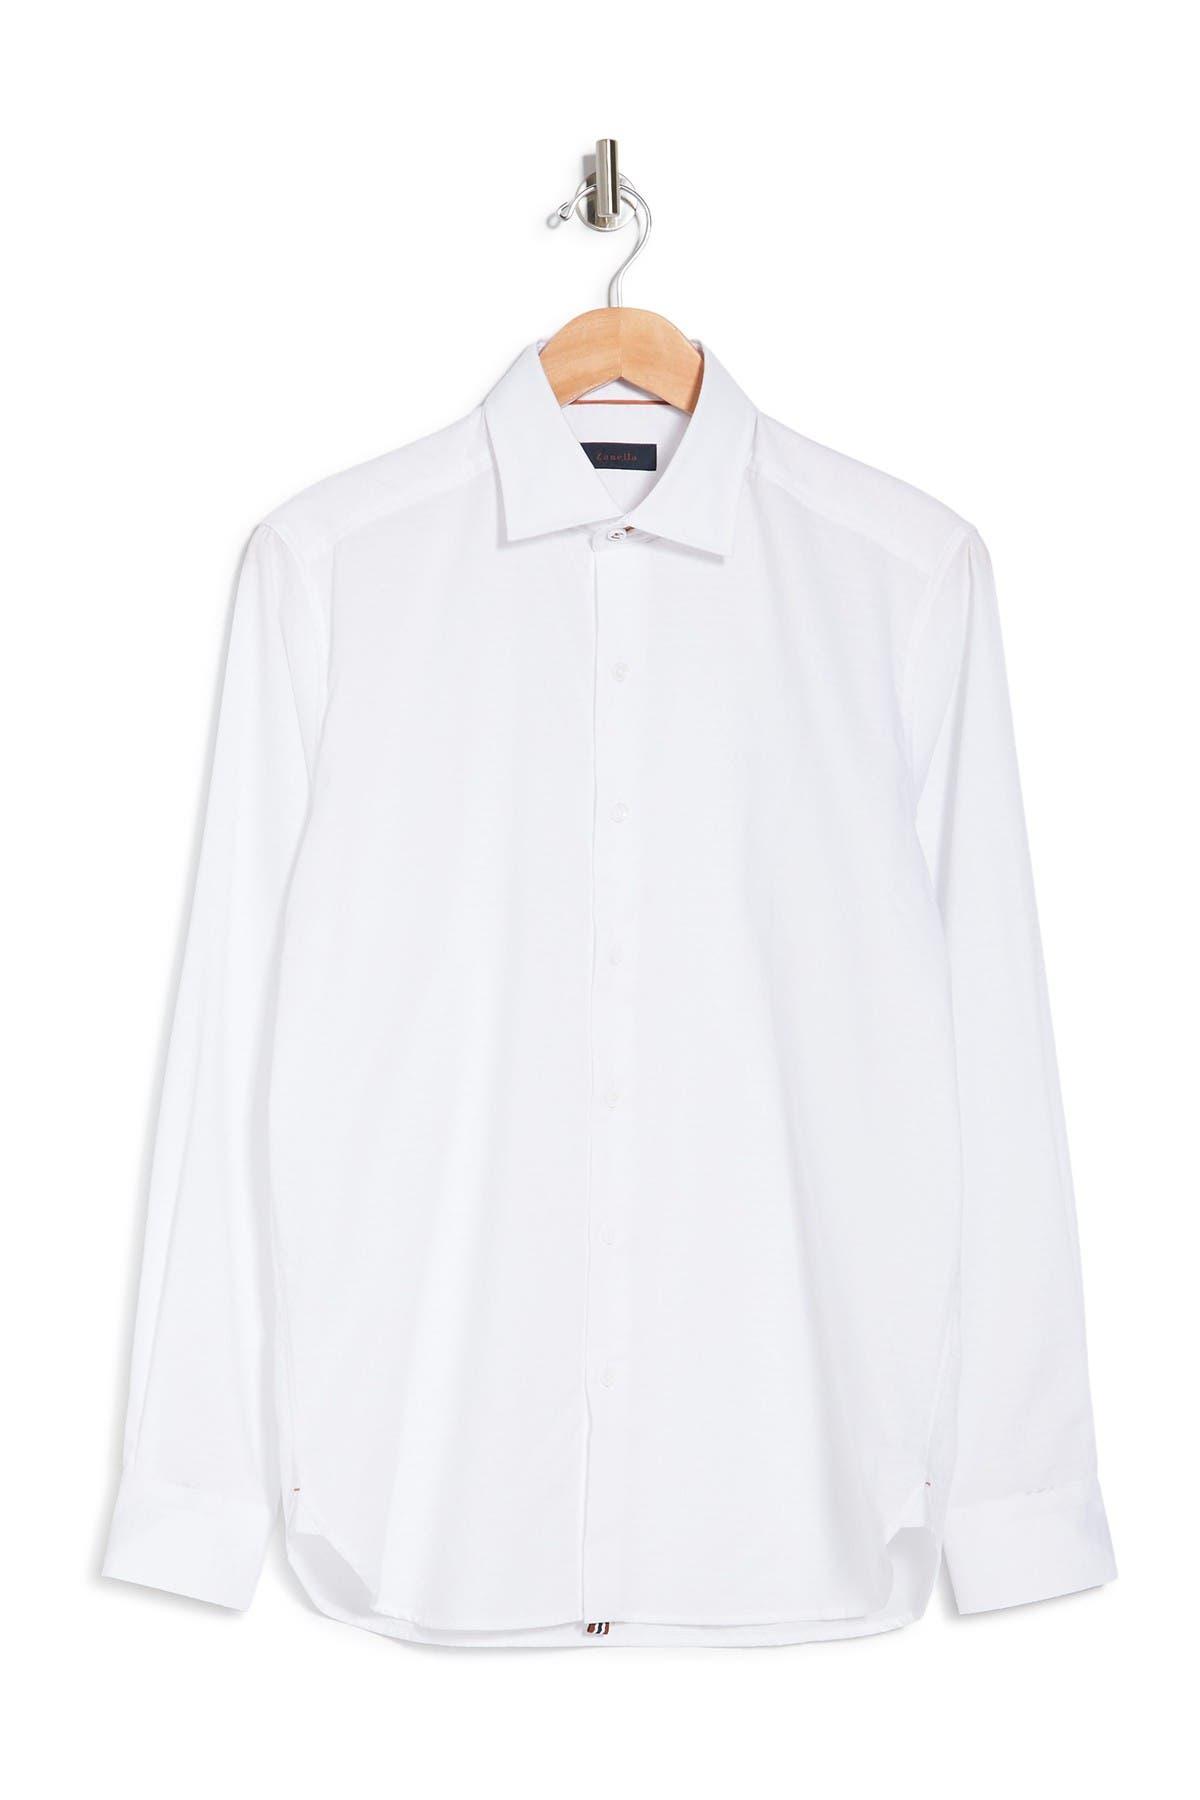 Image of Zanella Jacquard Print Long Sleeve Tailored Fit Shirt